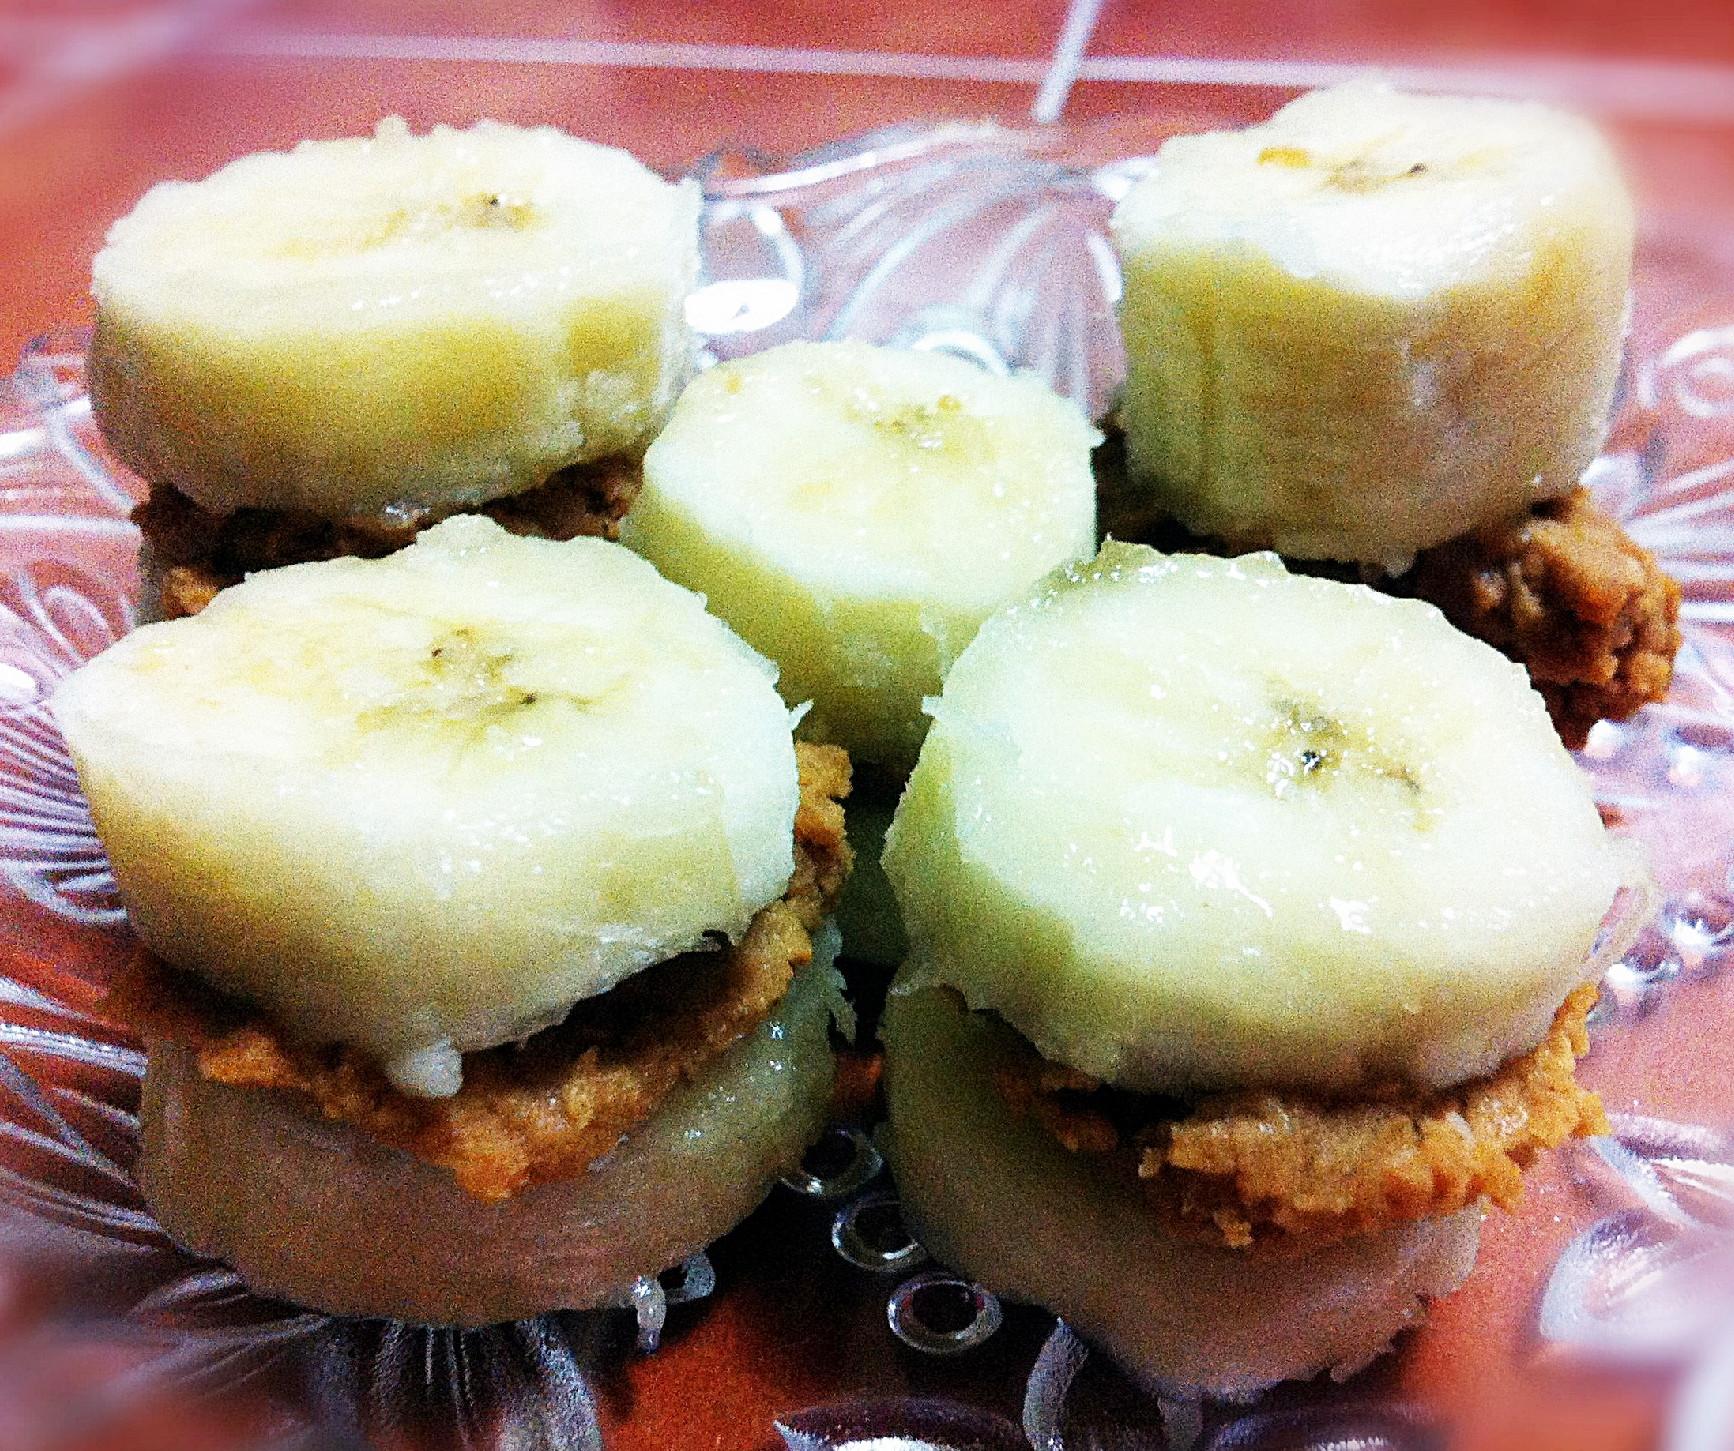 Healthy Sweet Desserts  Healthy Dessert Ideas Banana and Peanut Butter Bites